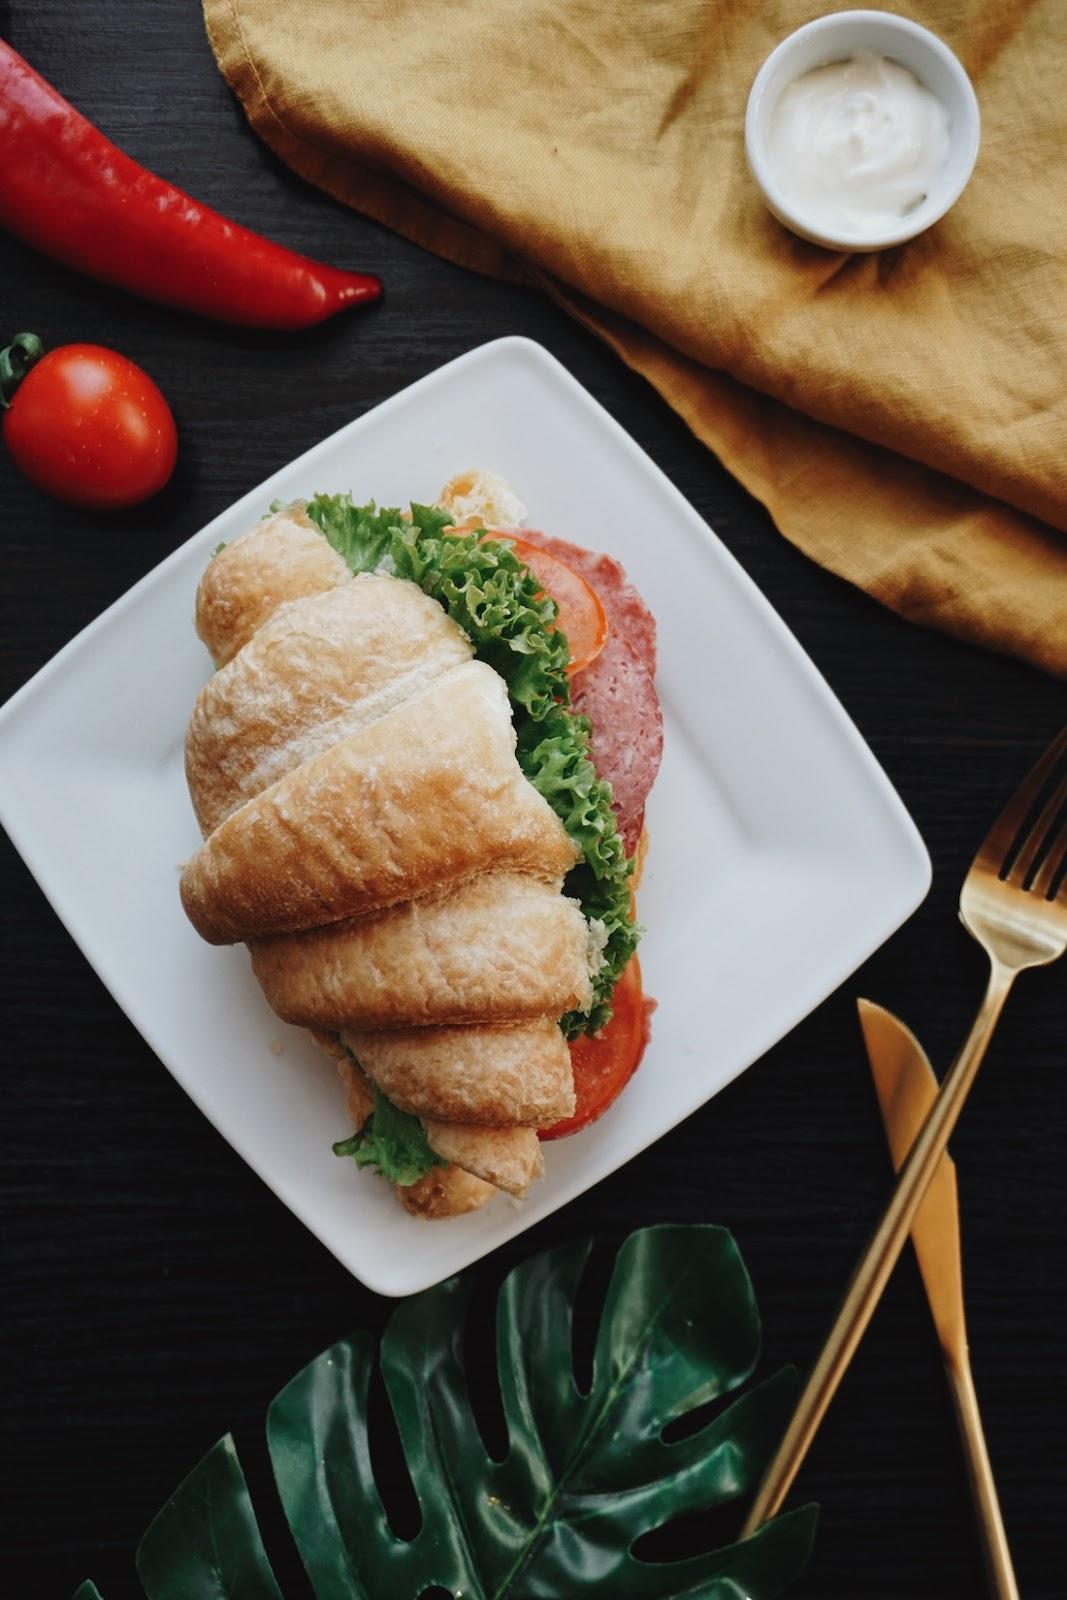 Croissant relleno de ingredientes salados (tomate, lechuga)